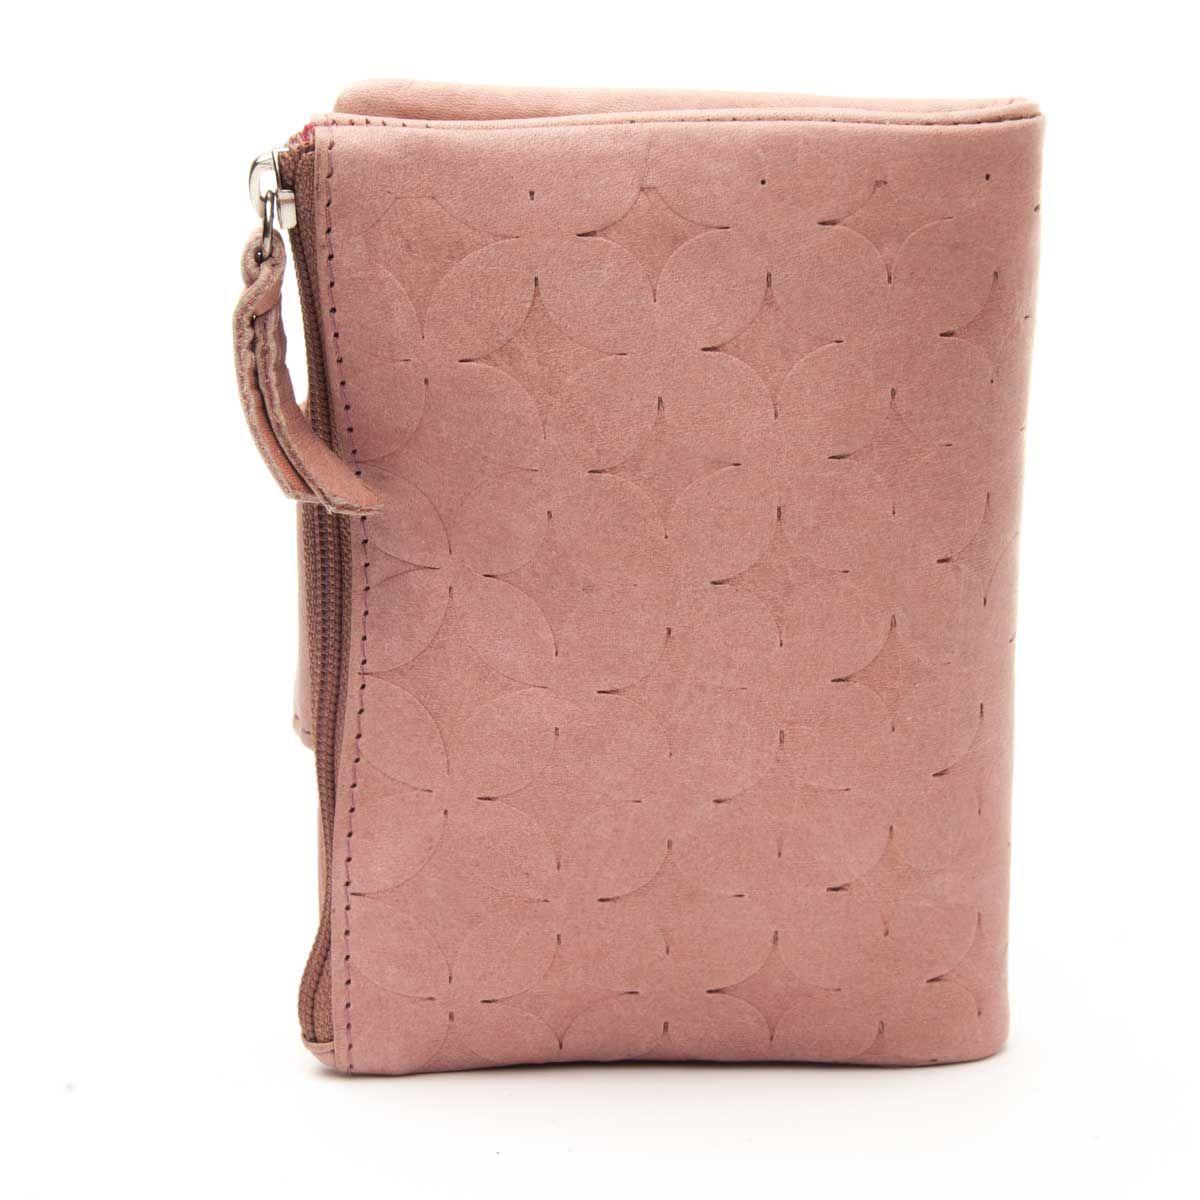 Montevita Leather Purse in Nude